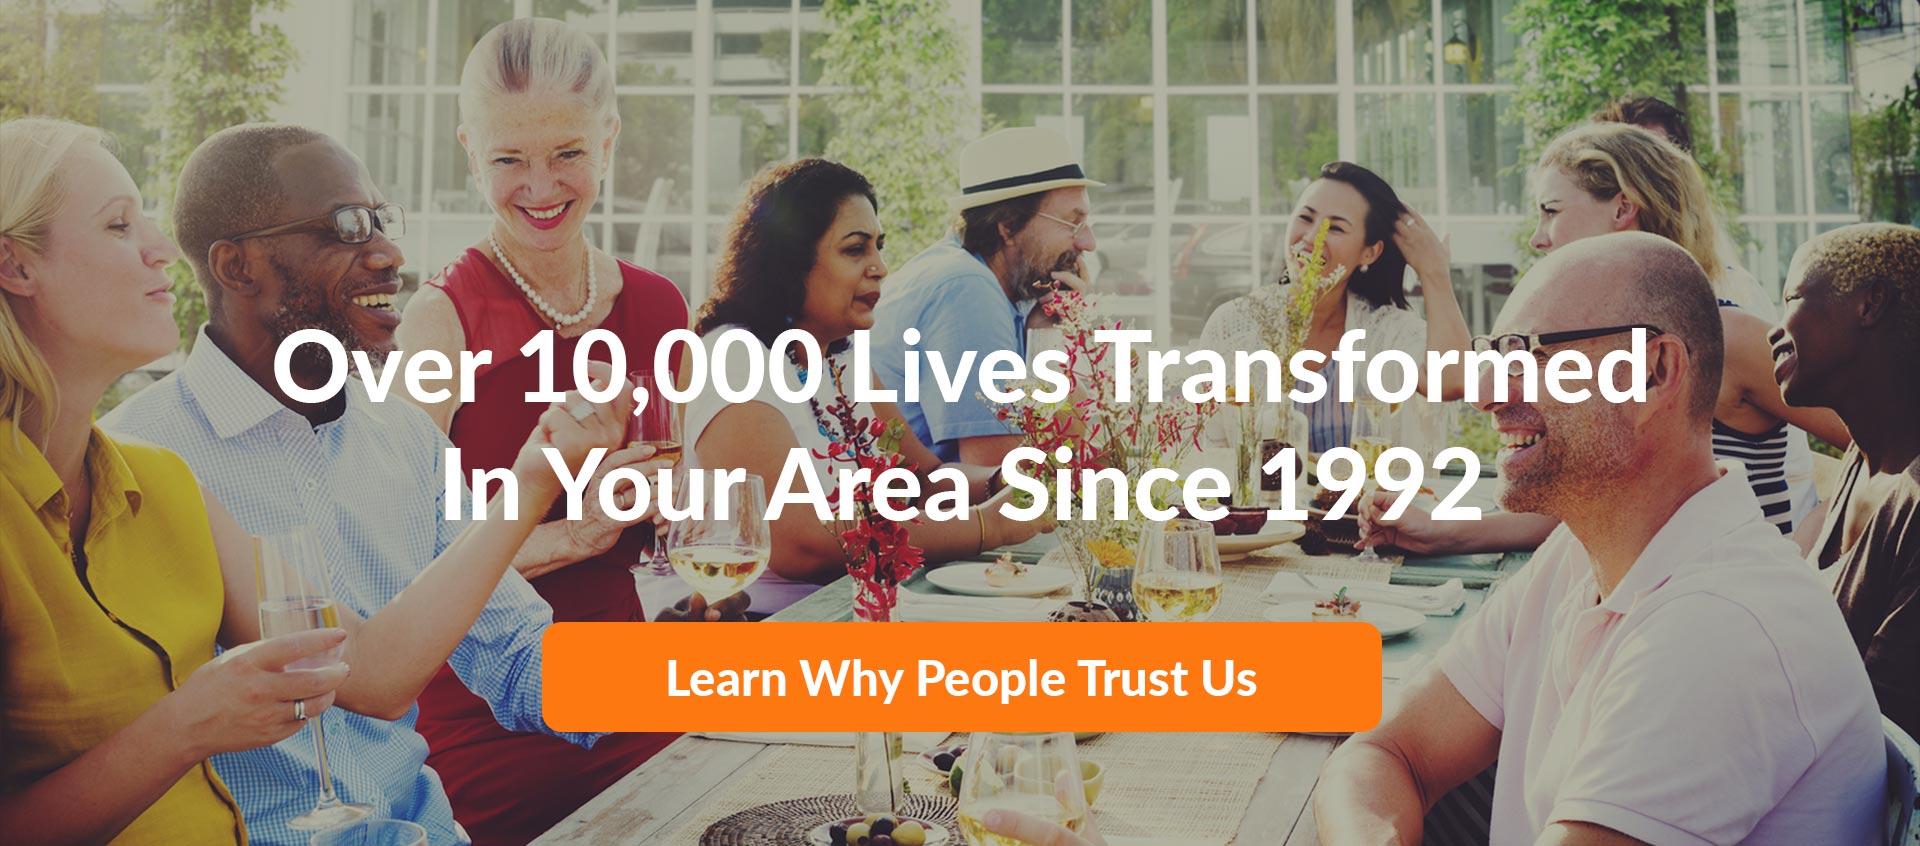 over 10000 lives transformed since 1992